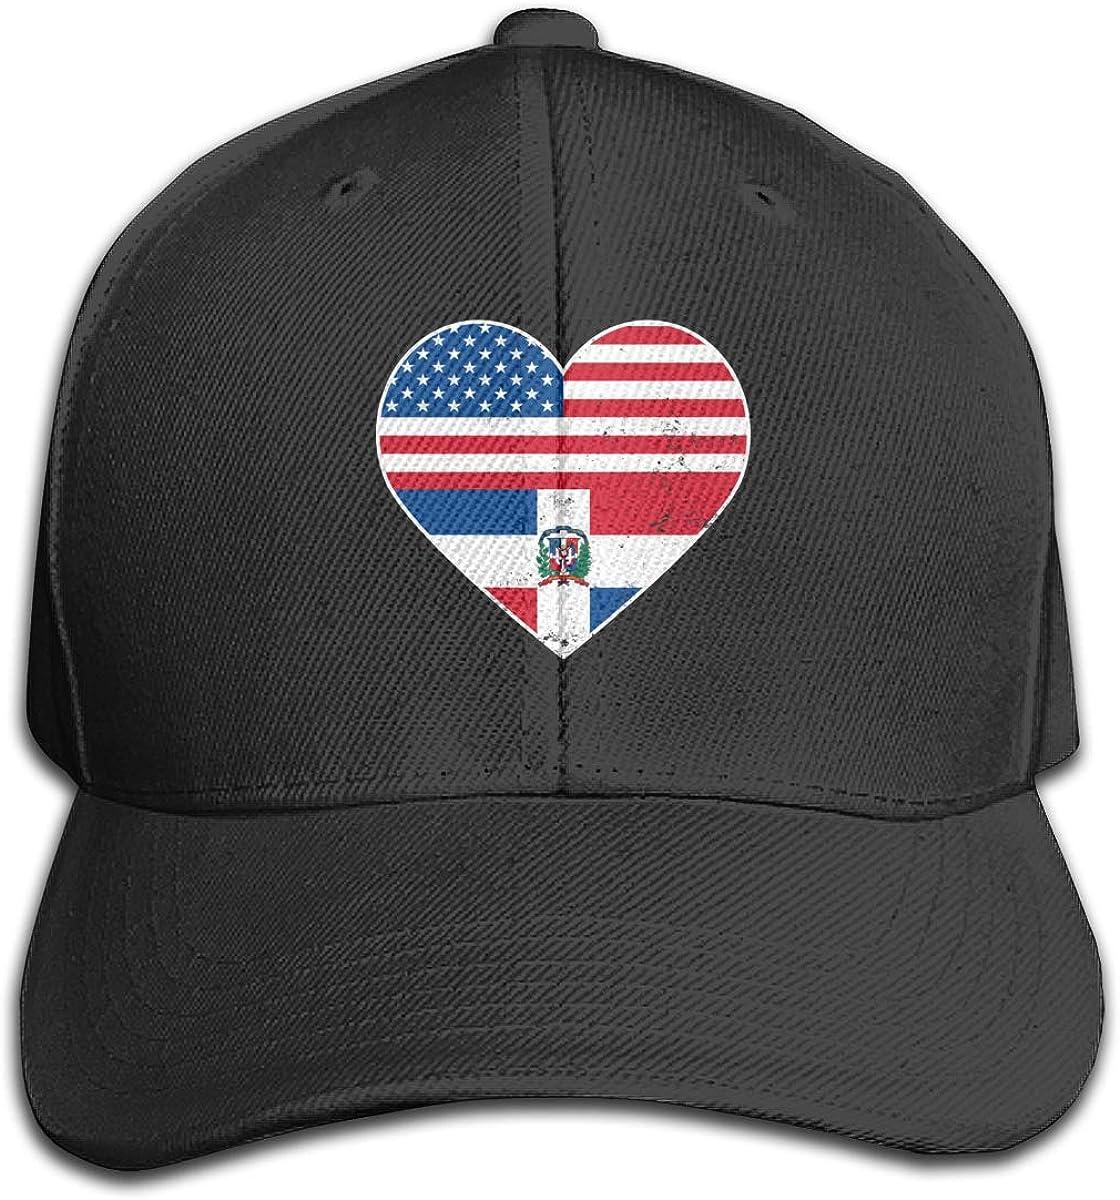 Zdsg Dominican Republic Dad Hat Unisex Cotton Hat Adjustable Baseball Cap